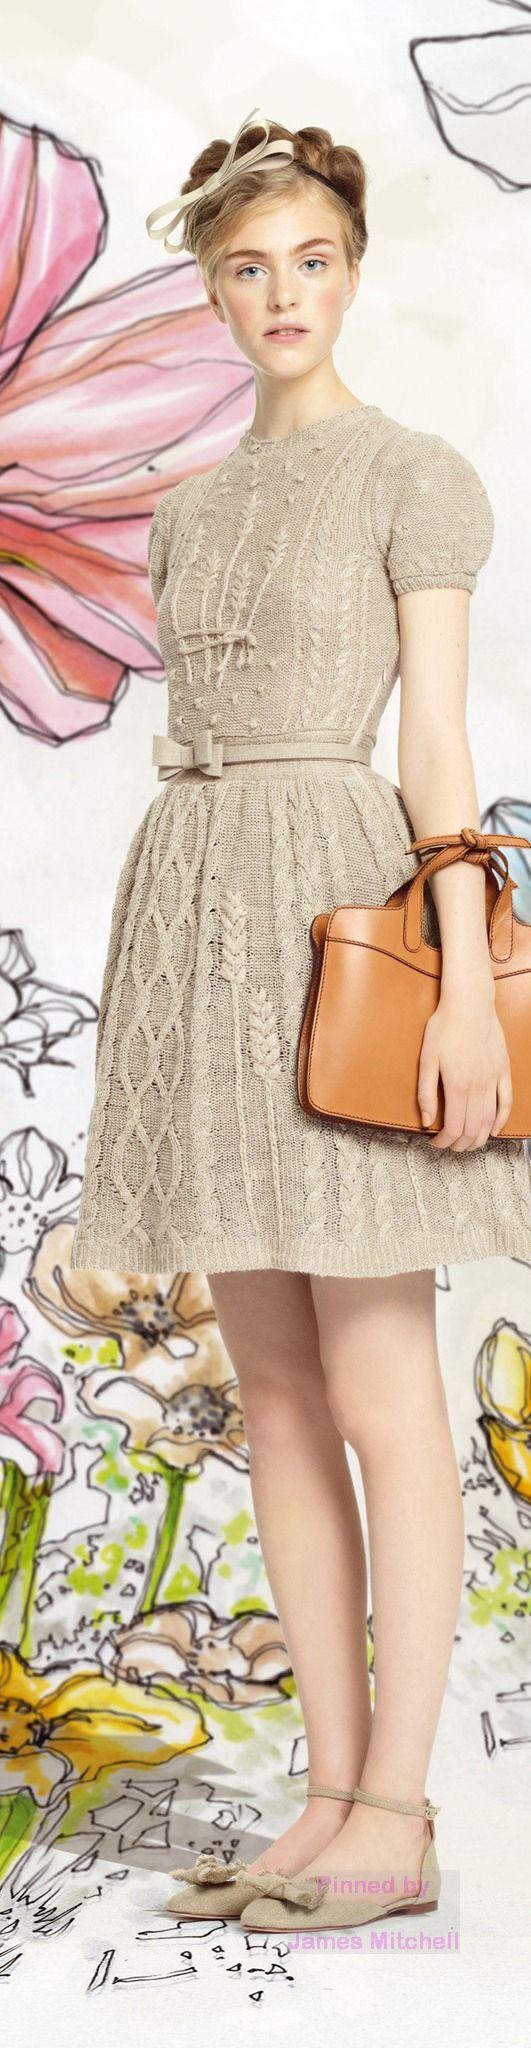 Узоры спицами для платья с колосками http://mslanavi.com/2014/01/modnoe-vyazanoe-plate-s-koloskami-ot-valentino/